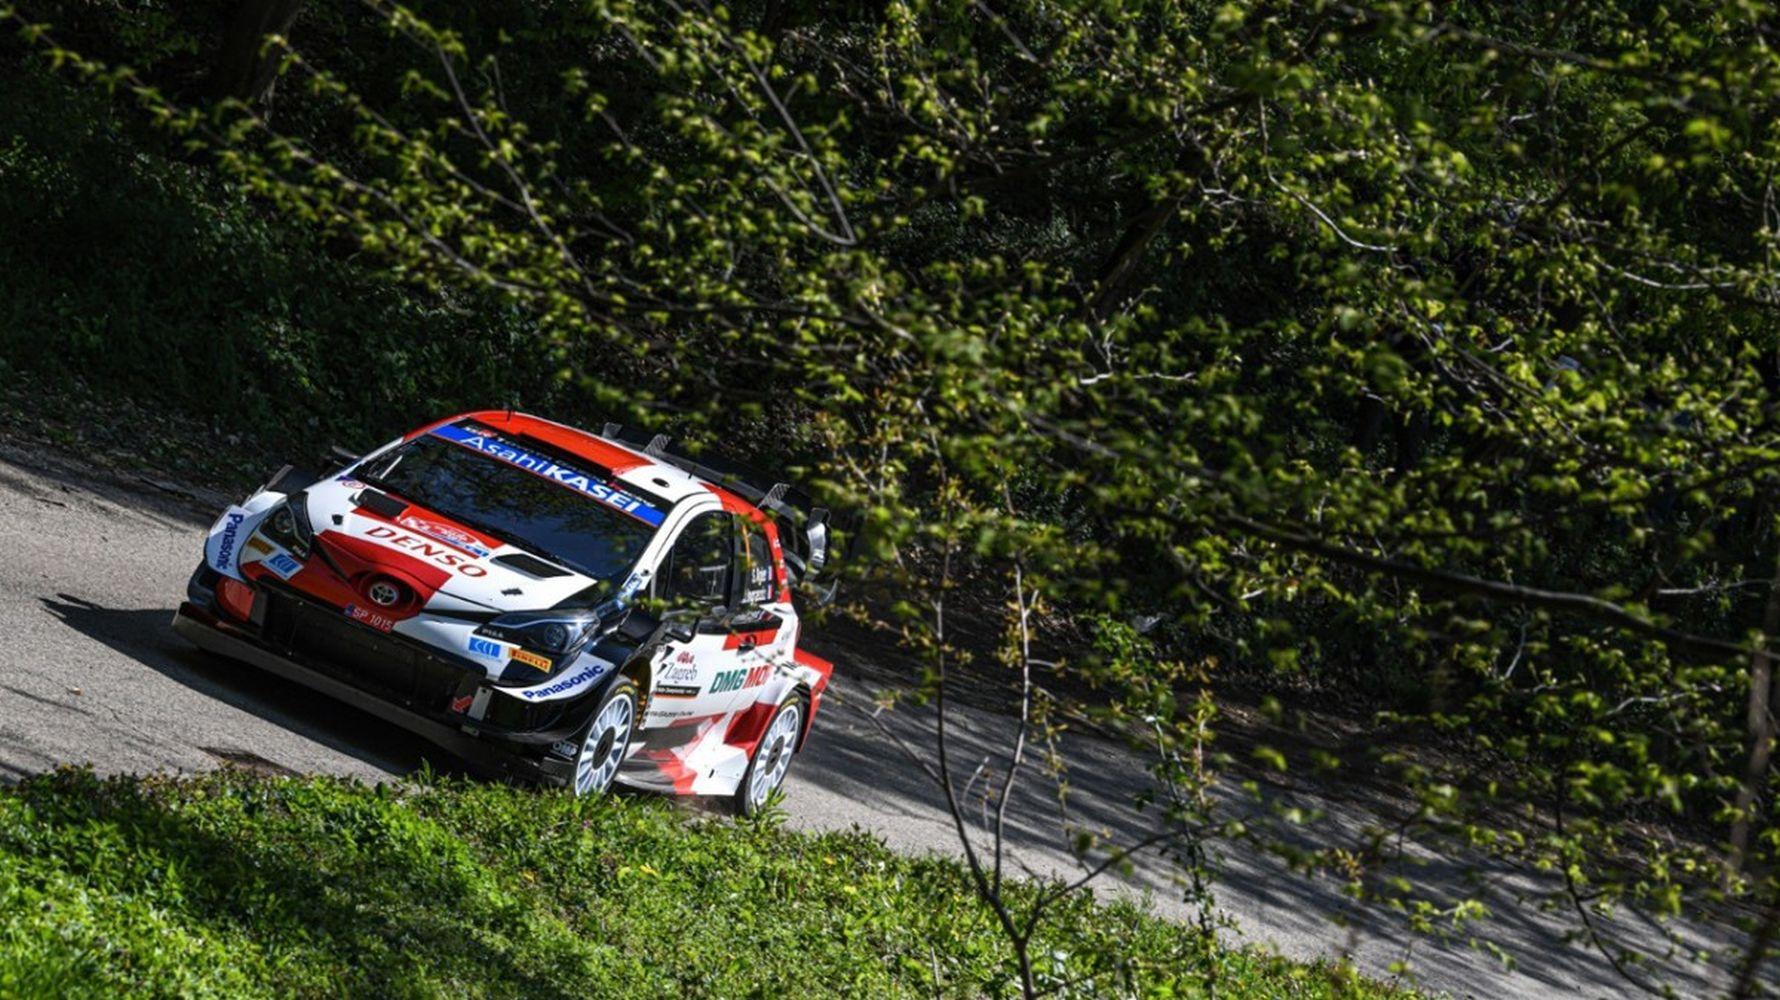 Pirelli tires mark croatia rally